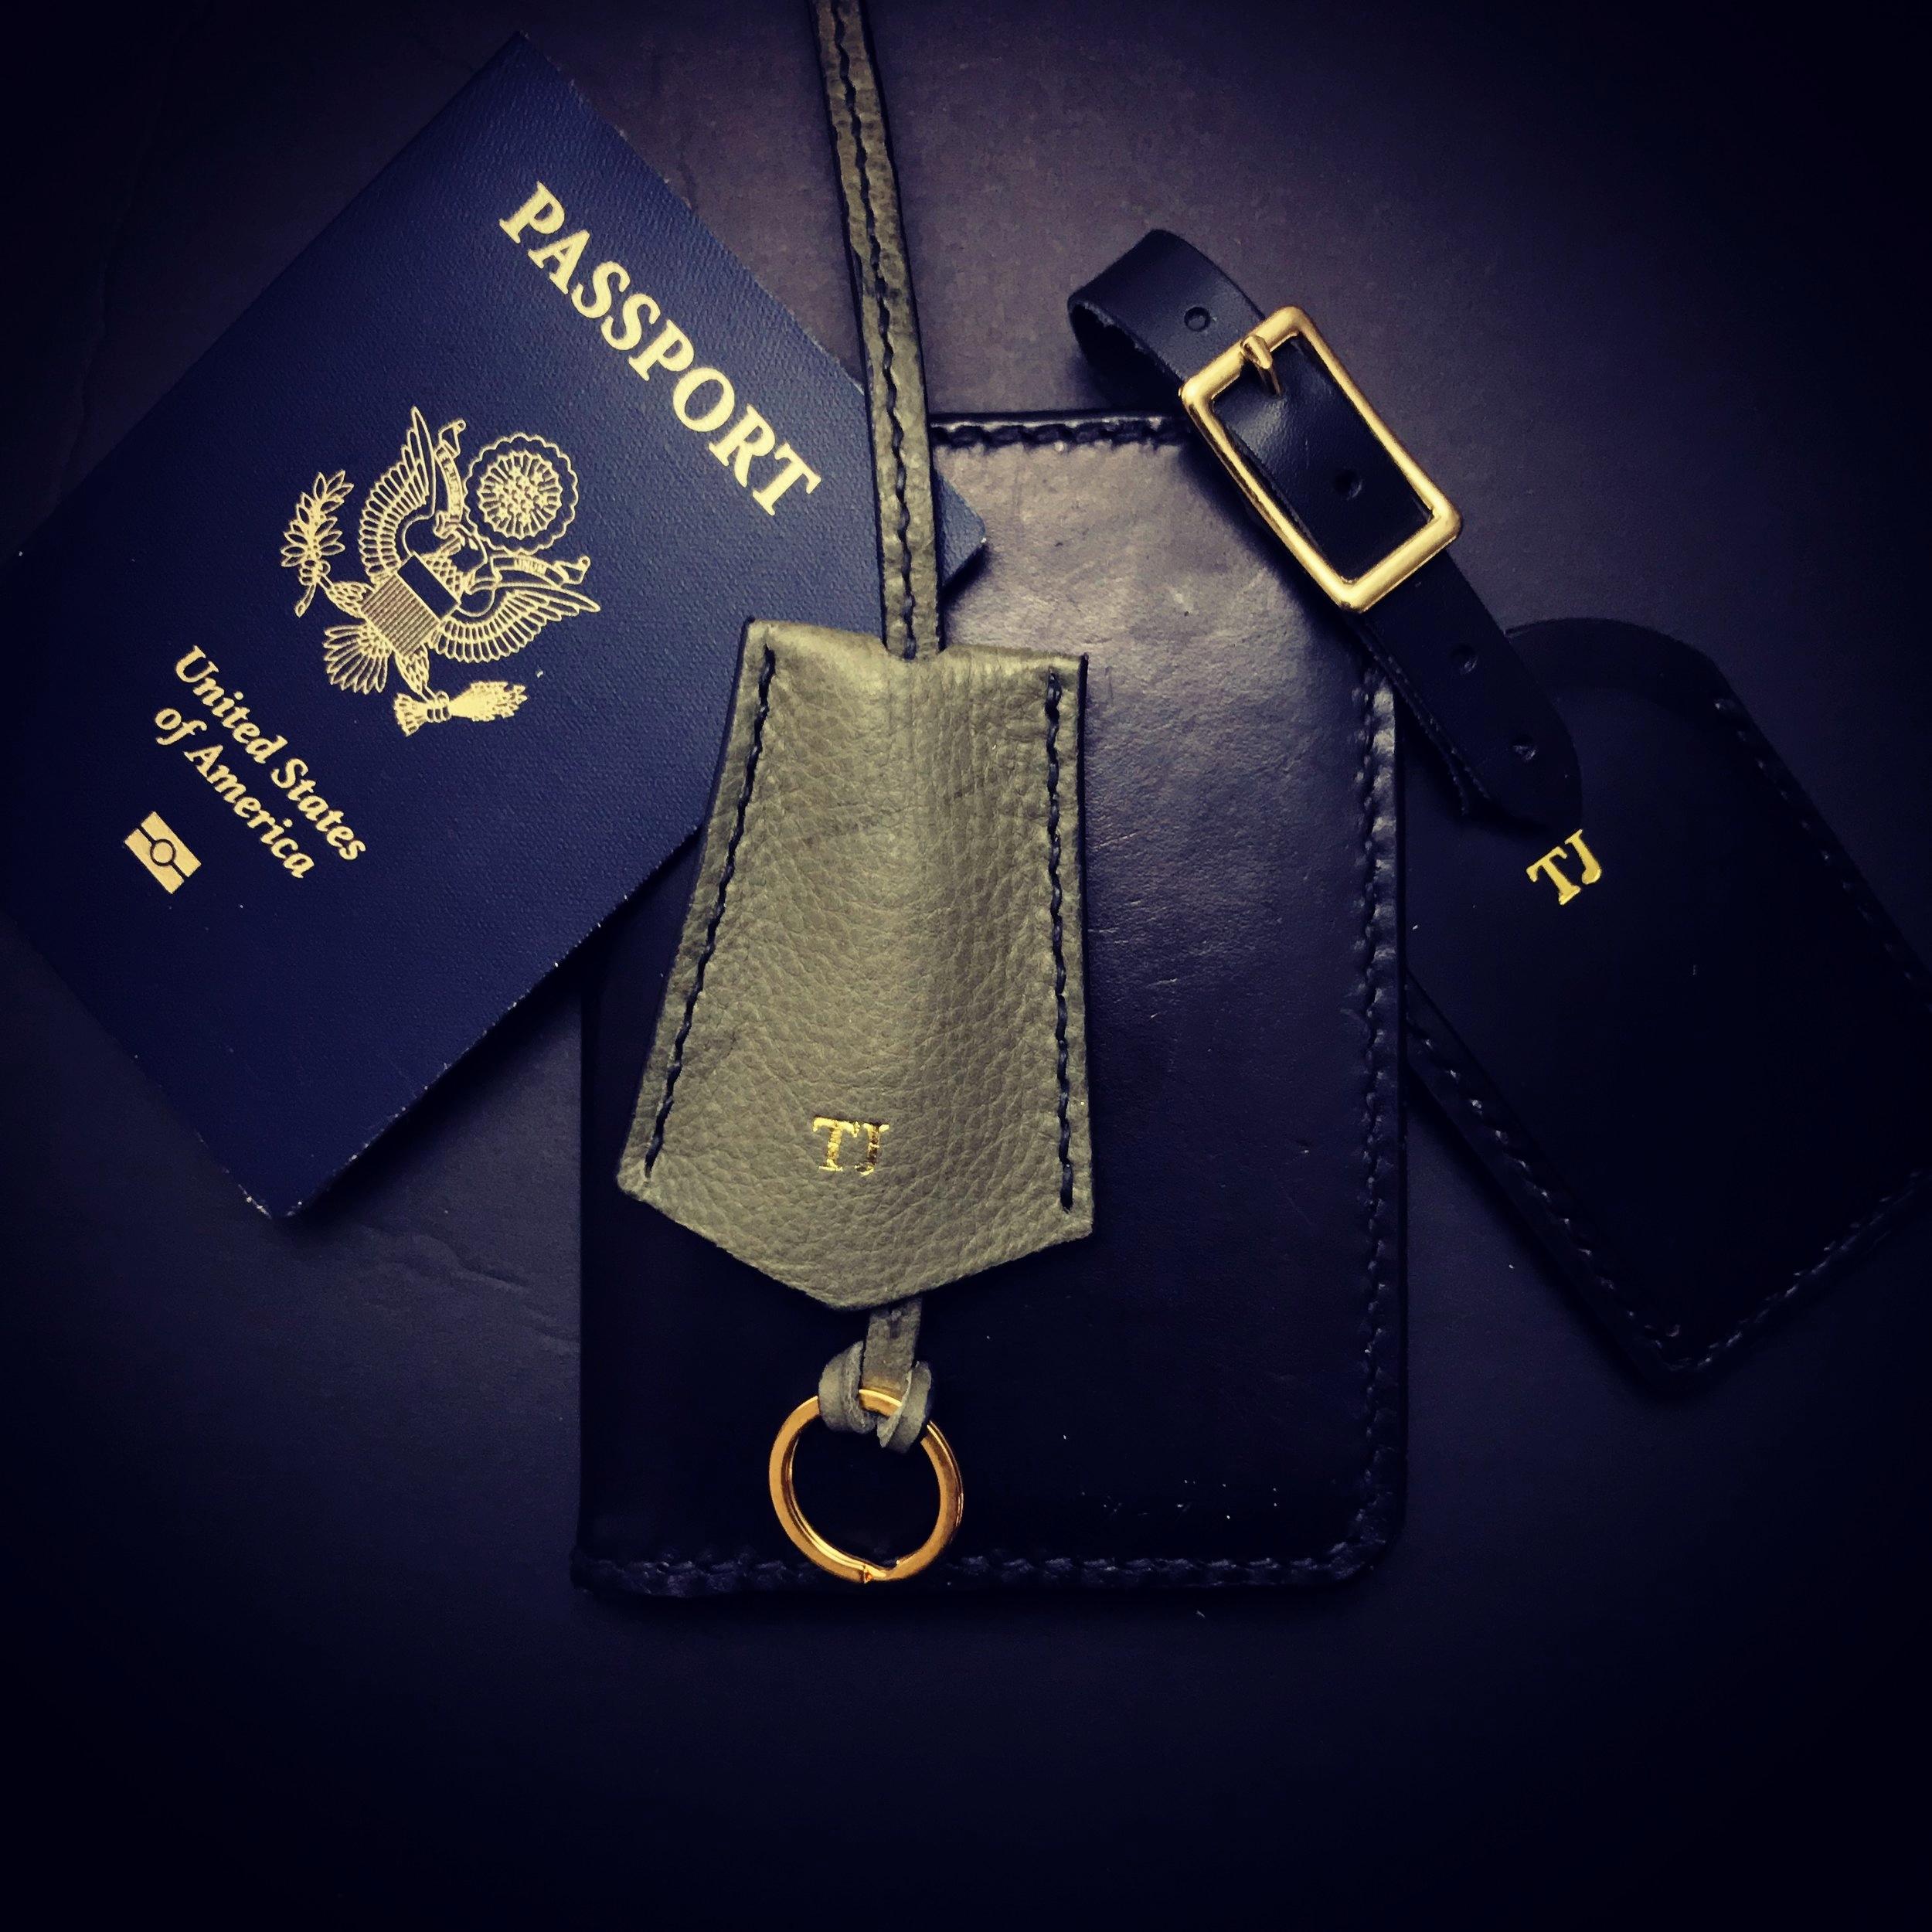 Travel Goods - Shop all essentials for travel.